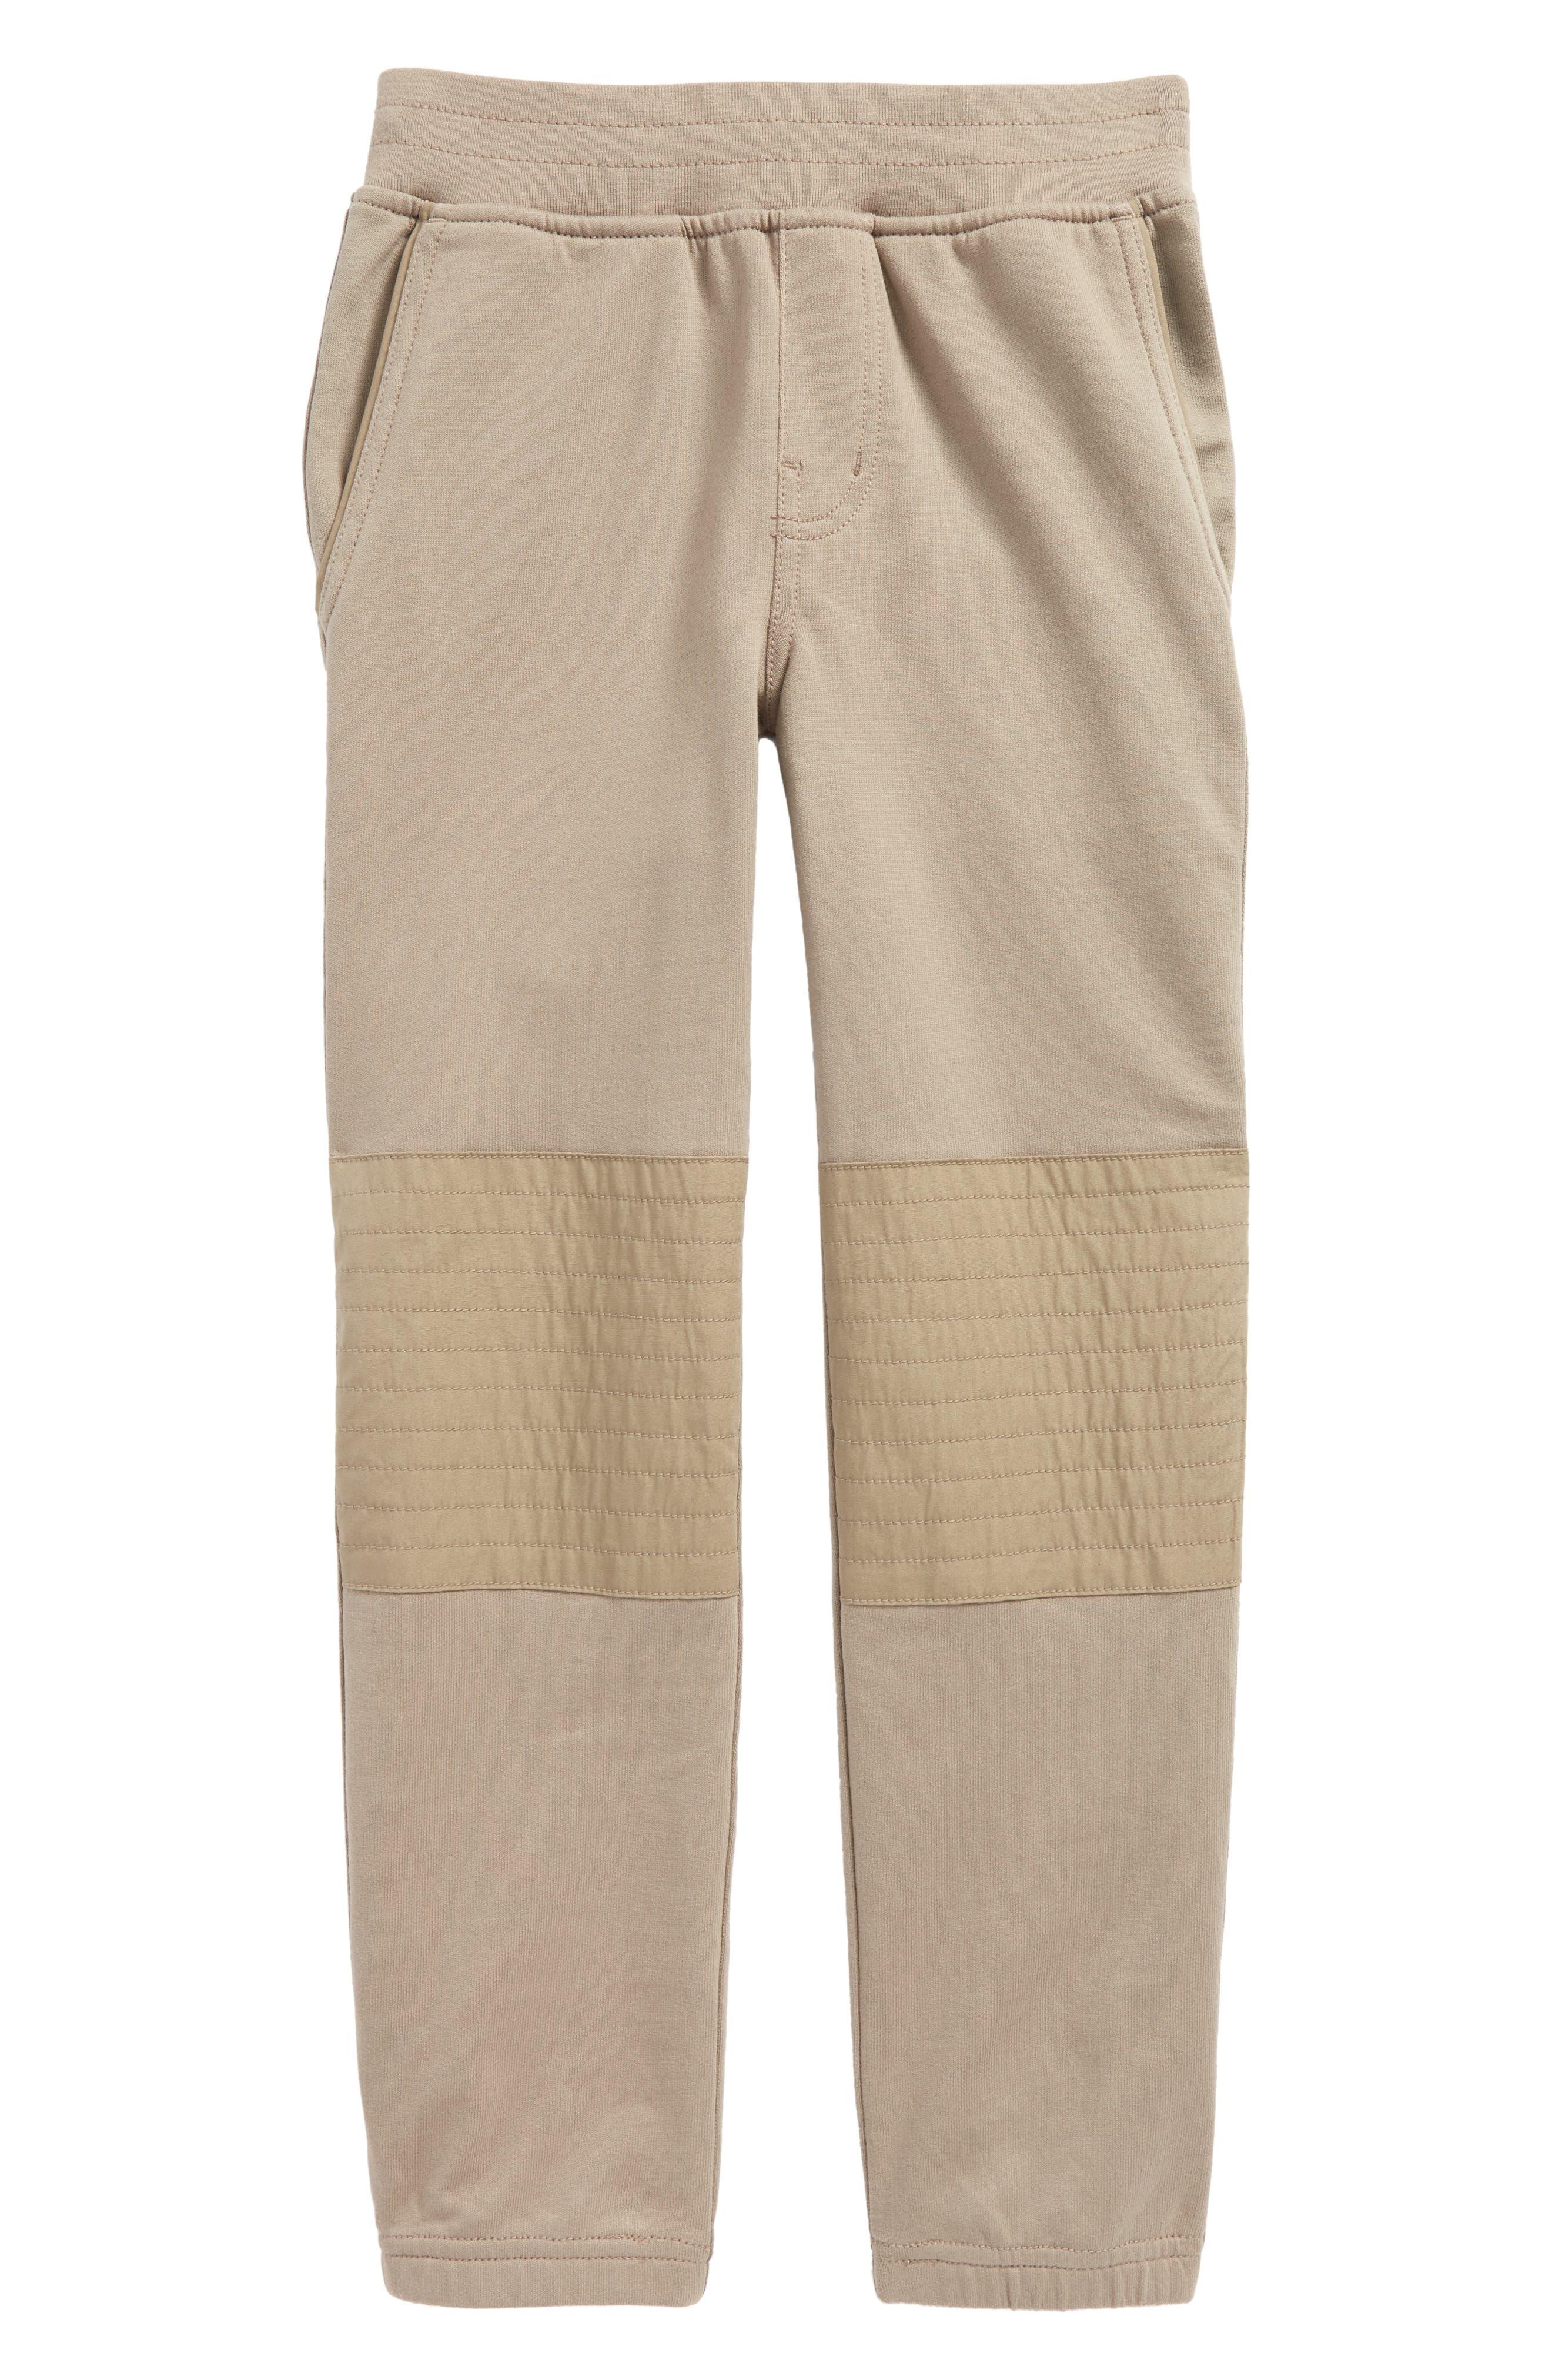 French Terry Moto Pants,                             Main thumbnail 1, color,                             268